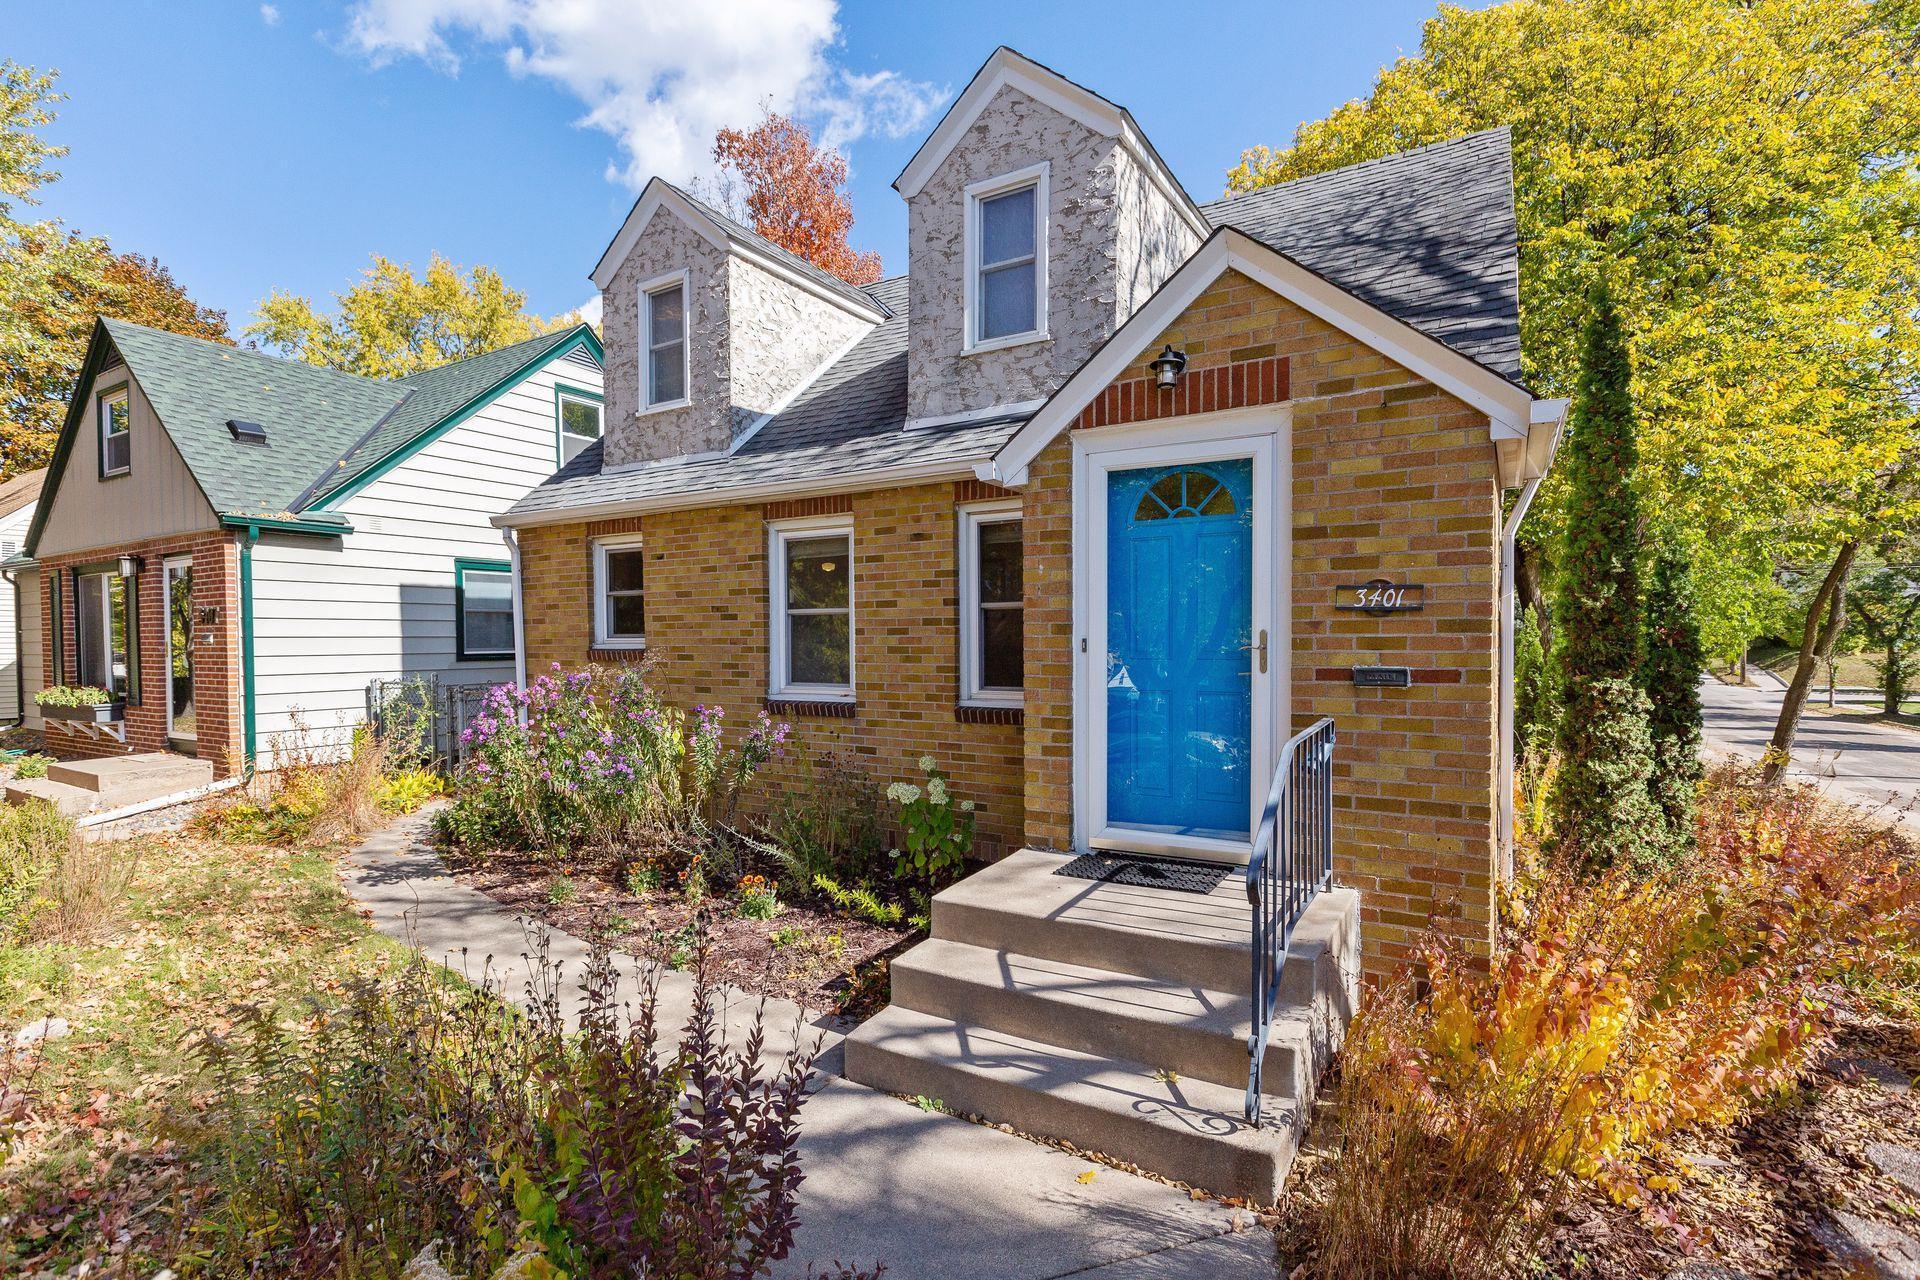 3401 Buchanan Street NE Property Photo - Minneapolis, MN real estate listing